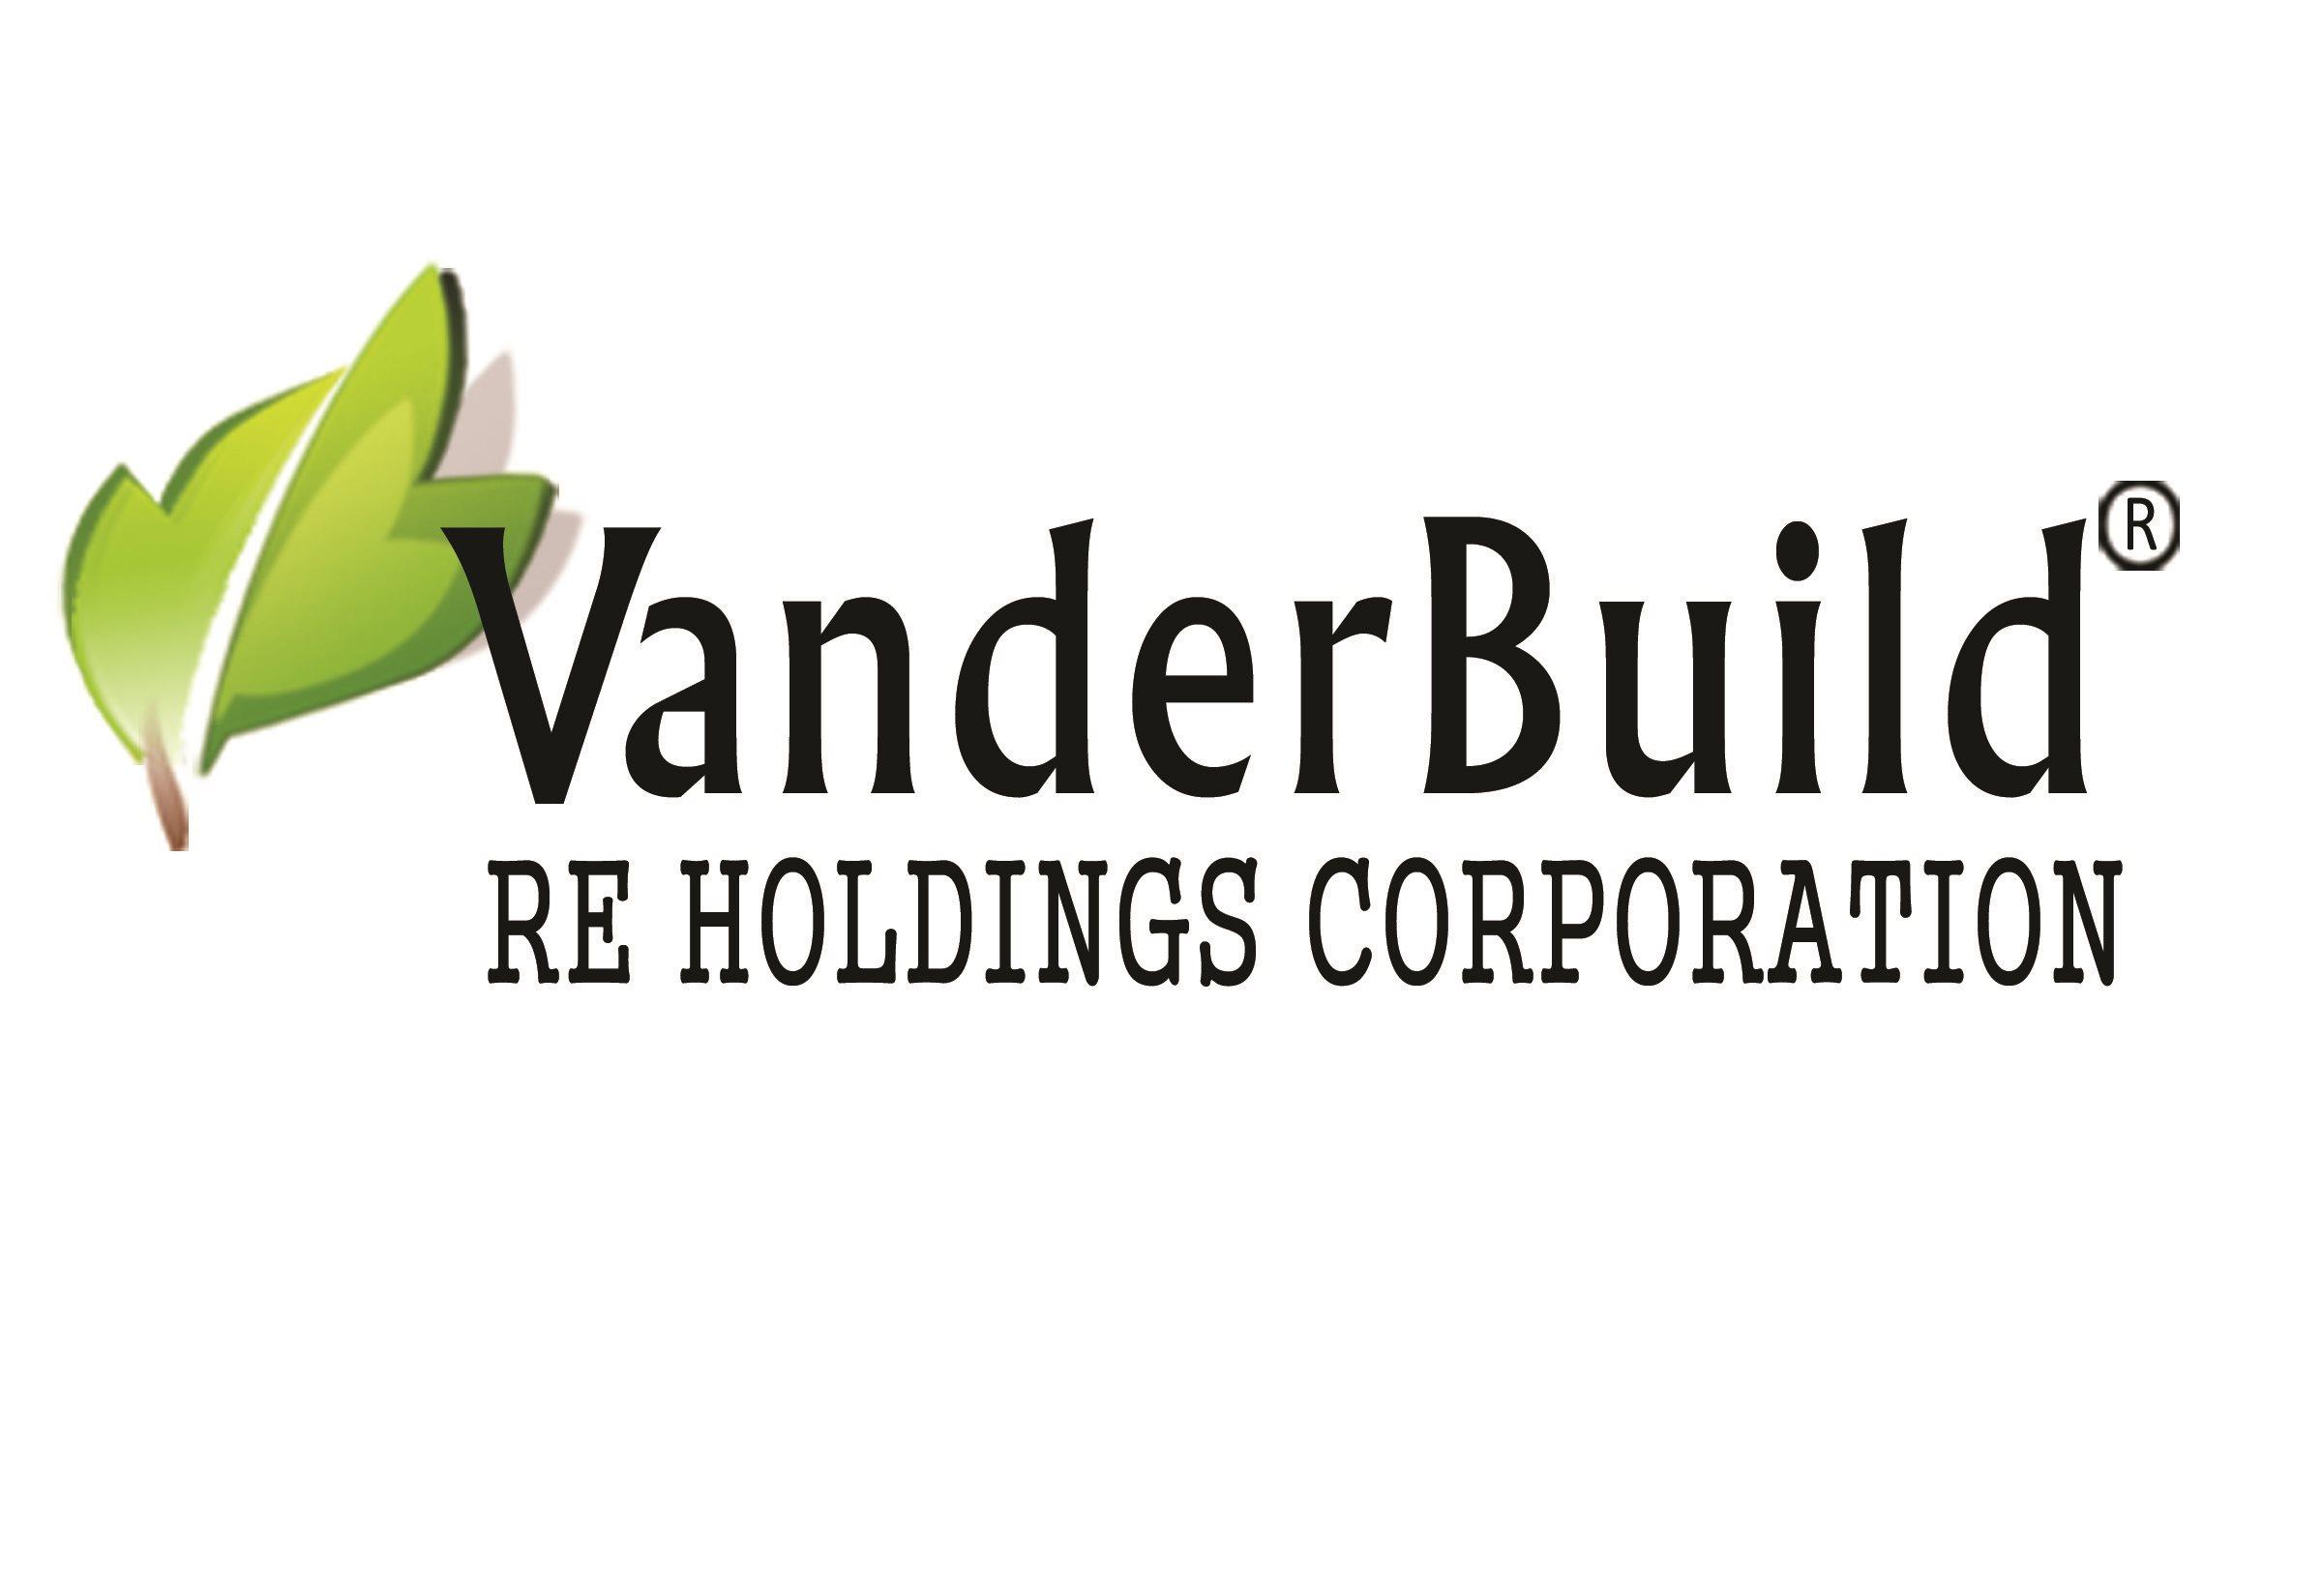 VanderBuild RE Holdings Corporation